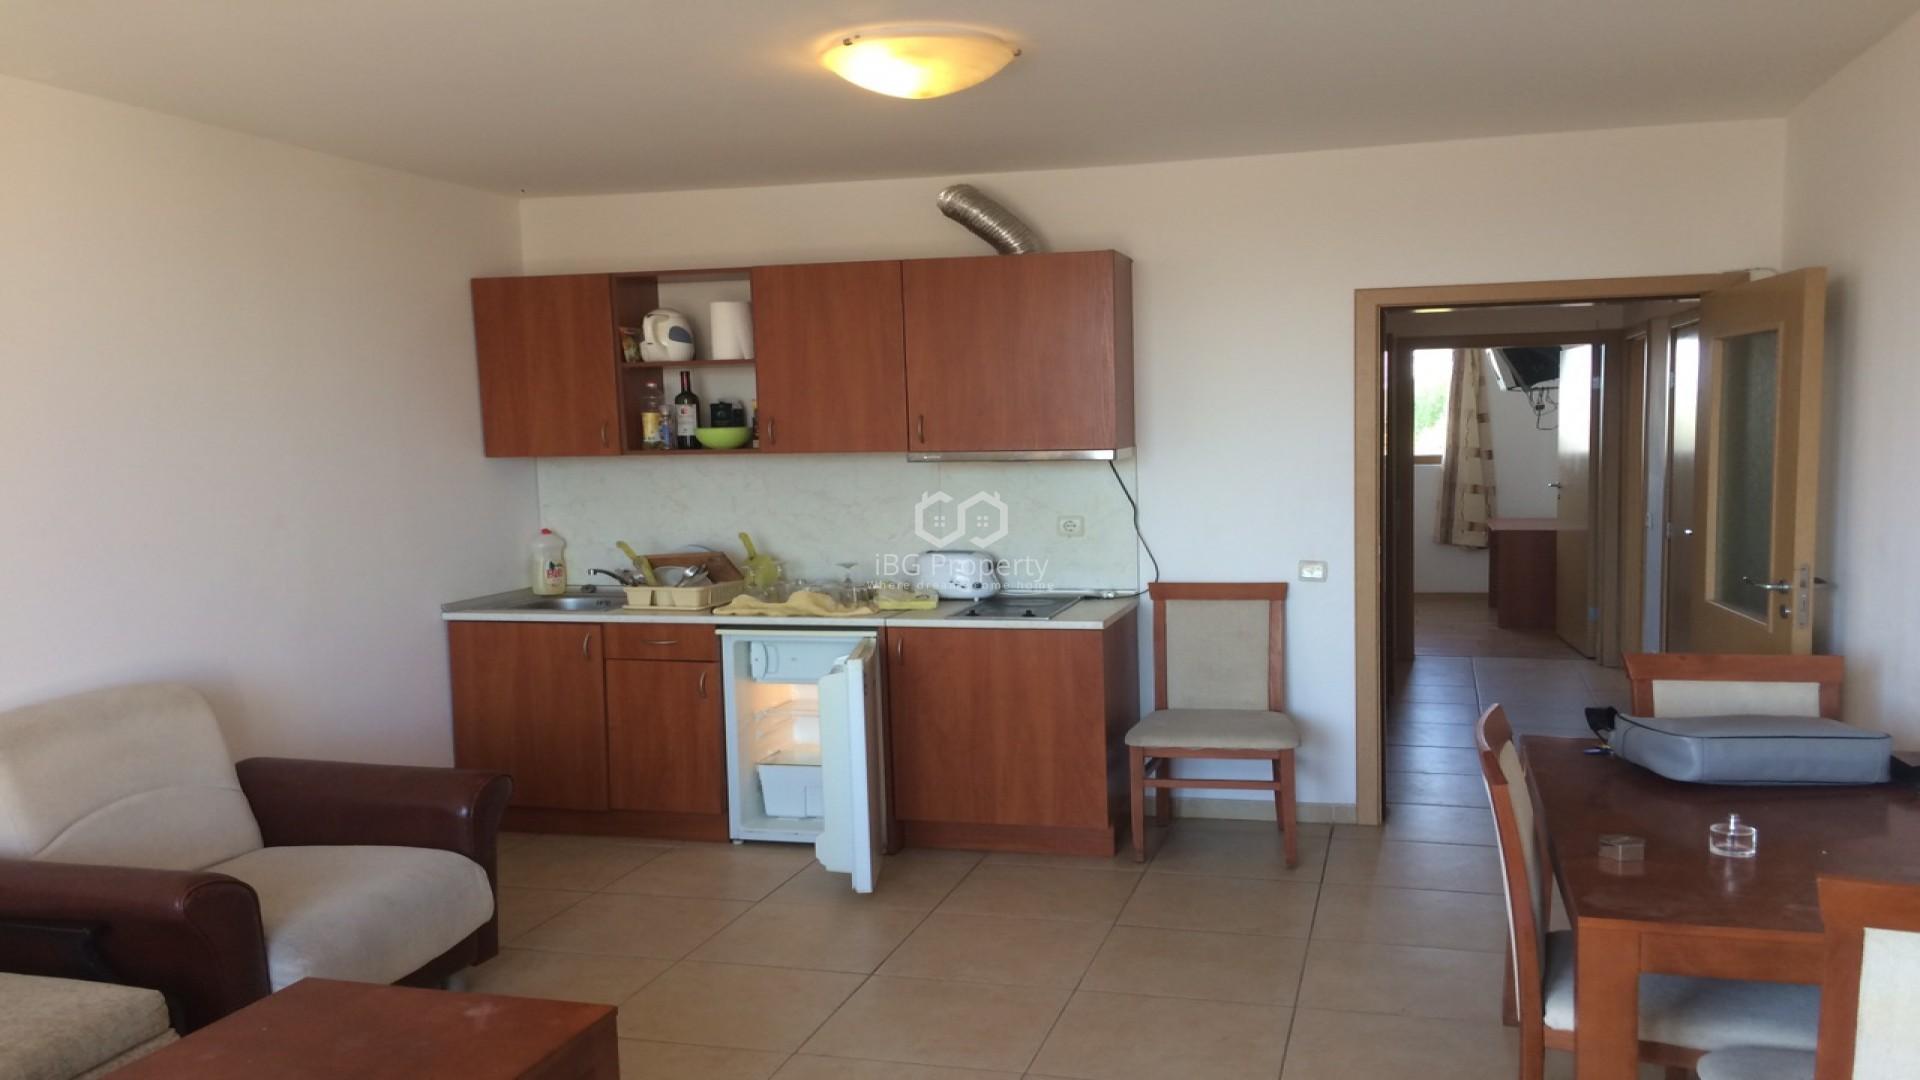 Трехкомнатная квартира Слънчев Бряг 110 m2